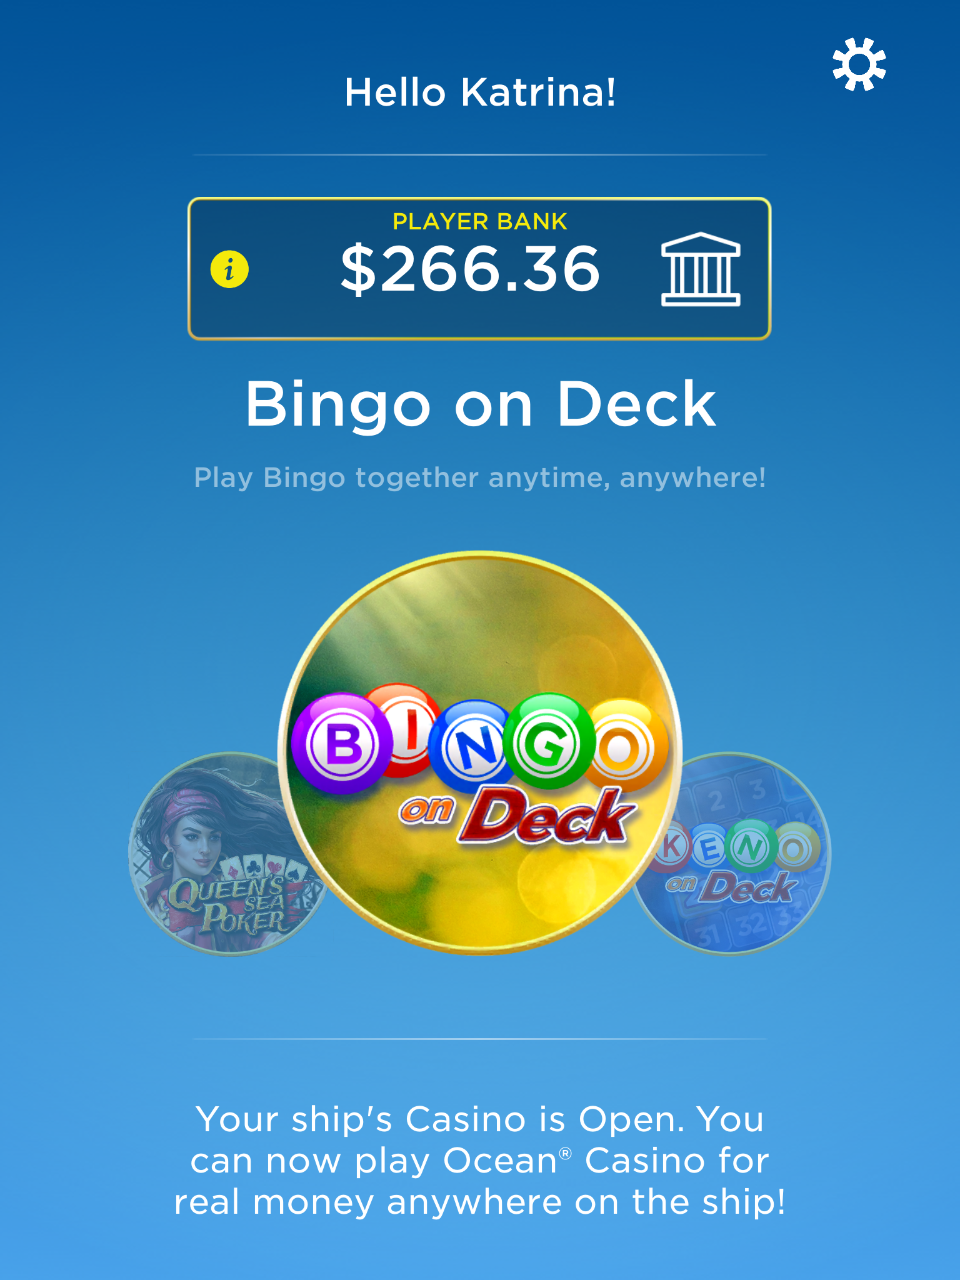 My winnings today!